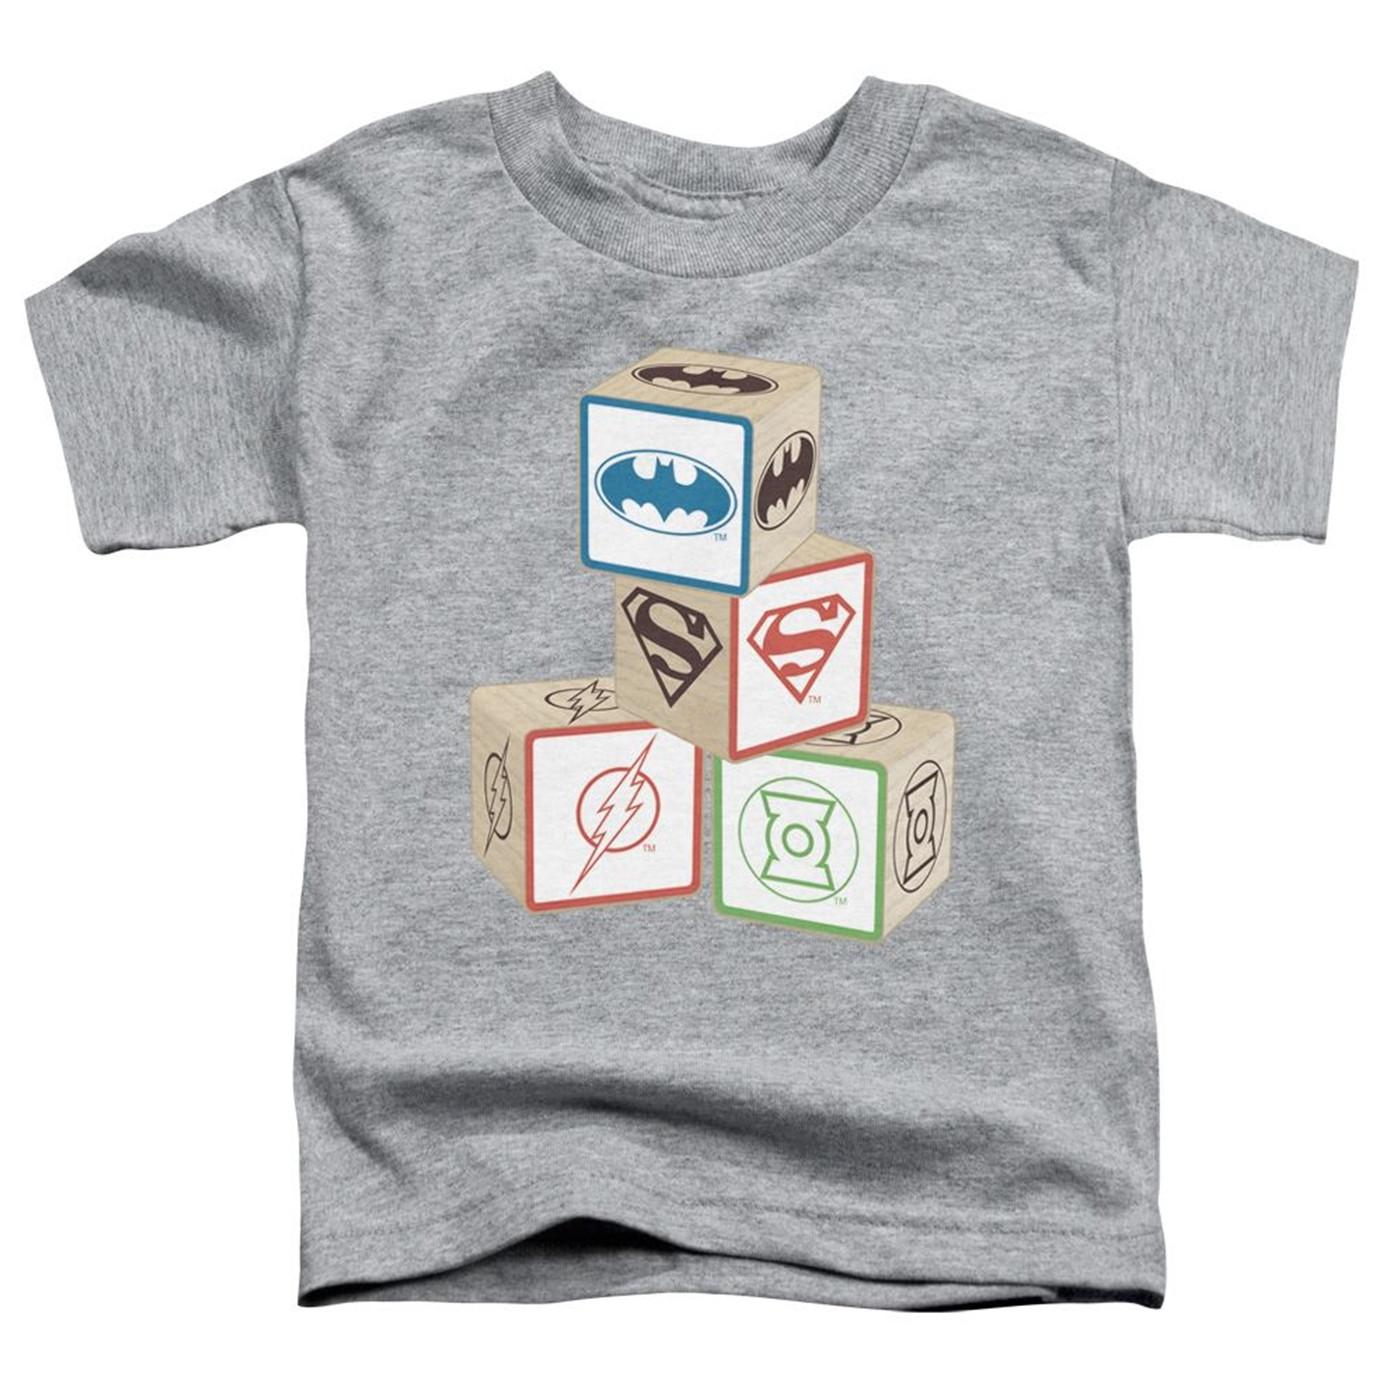 Justice League Symbols Baby Blocks Kids T-Shirt